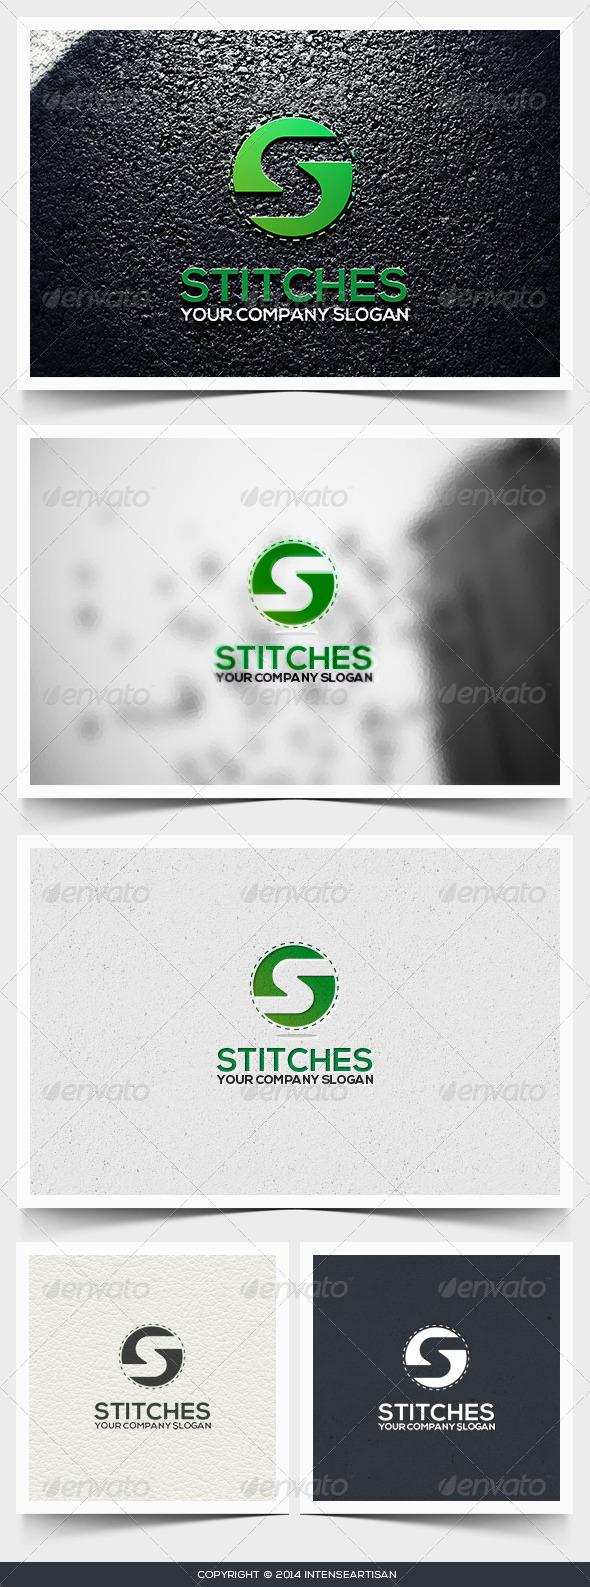 Stitches Logo Template